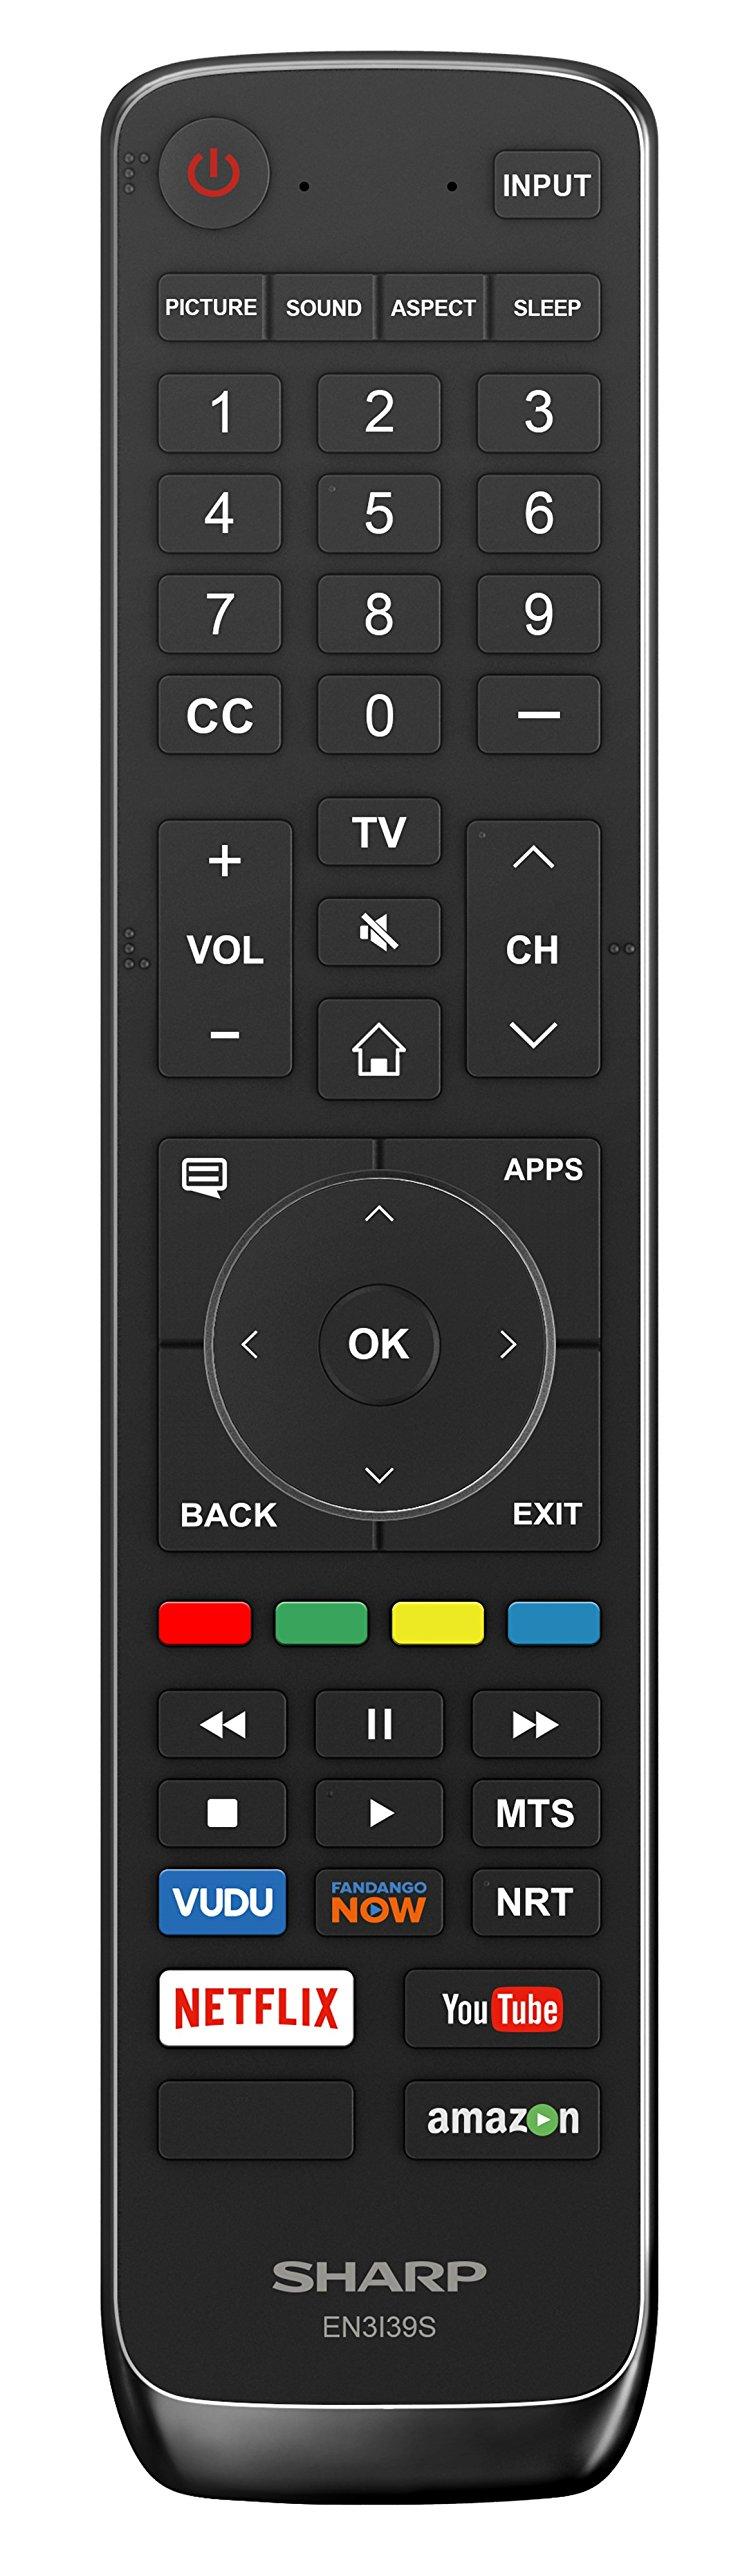 "55"" TV 4K Smart 2160p UHD Sharp Aquos Apps 2"